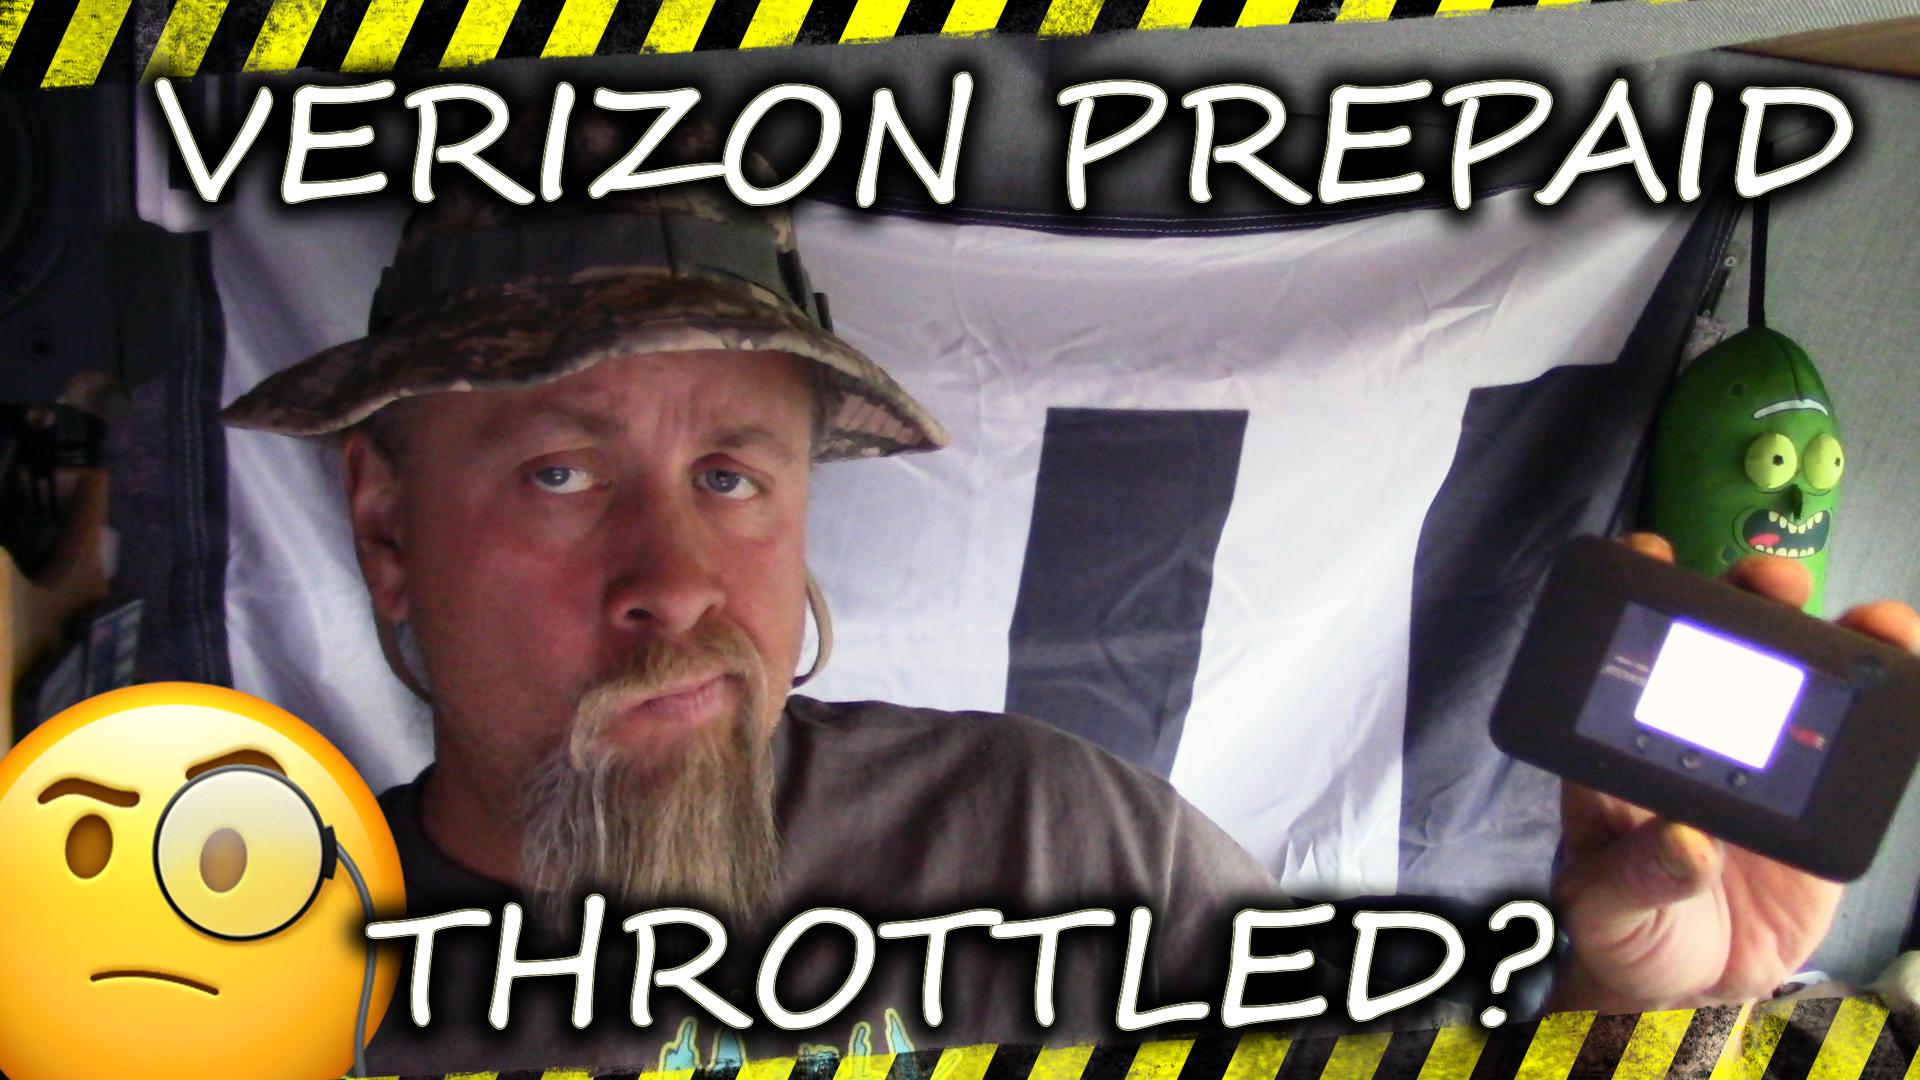 Verizon's prepaid unlimited hotspot plan